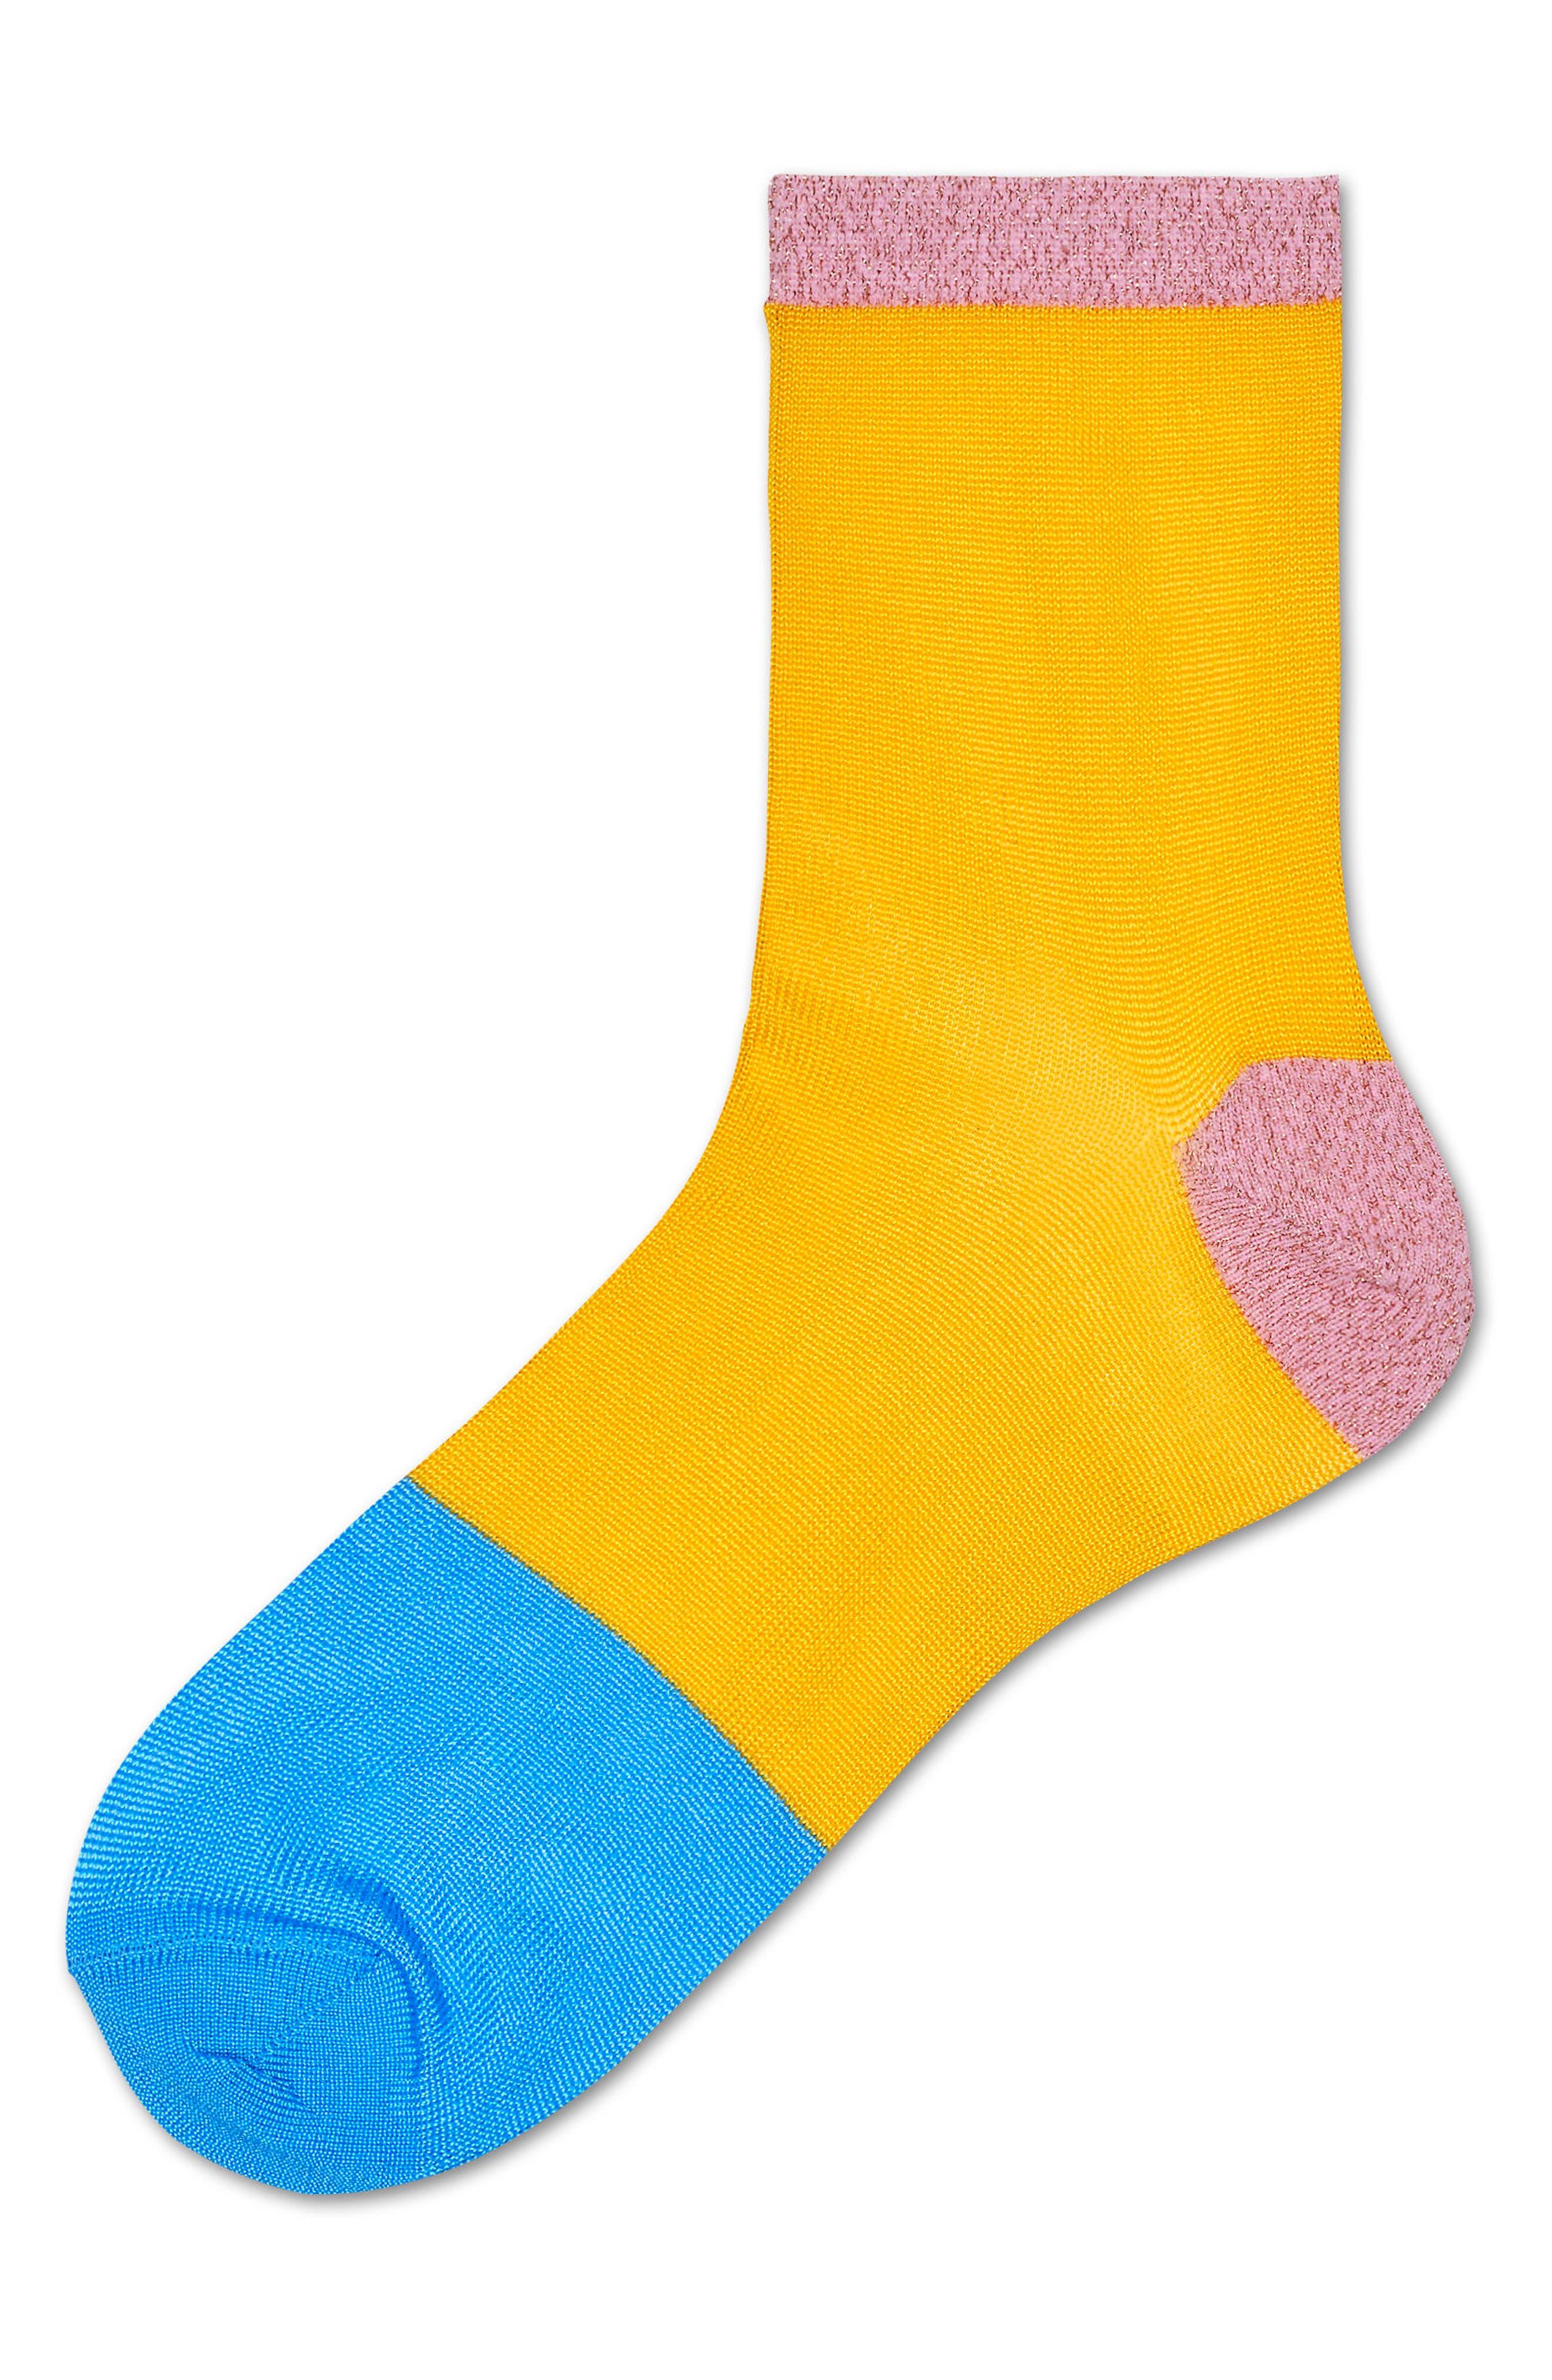 Liza Sparkle Ankle Socks,                             Alternate thumbnail 3, color,                             Yellow